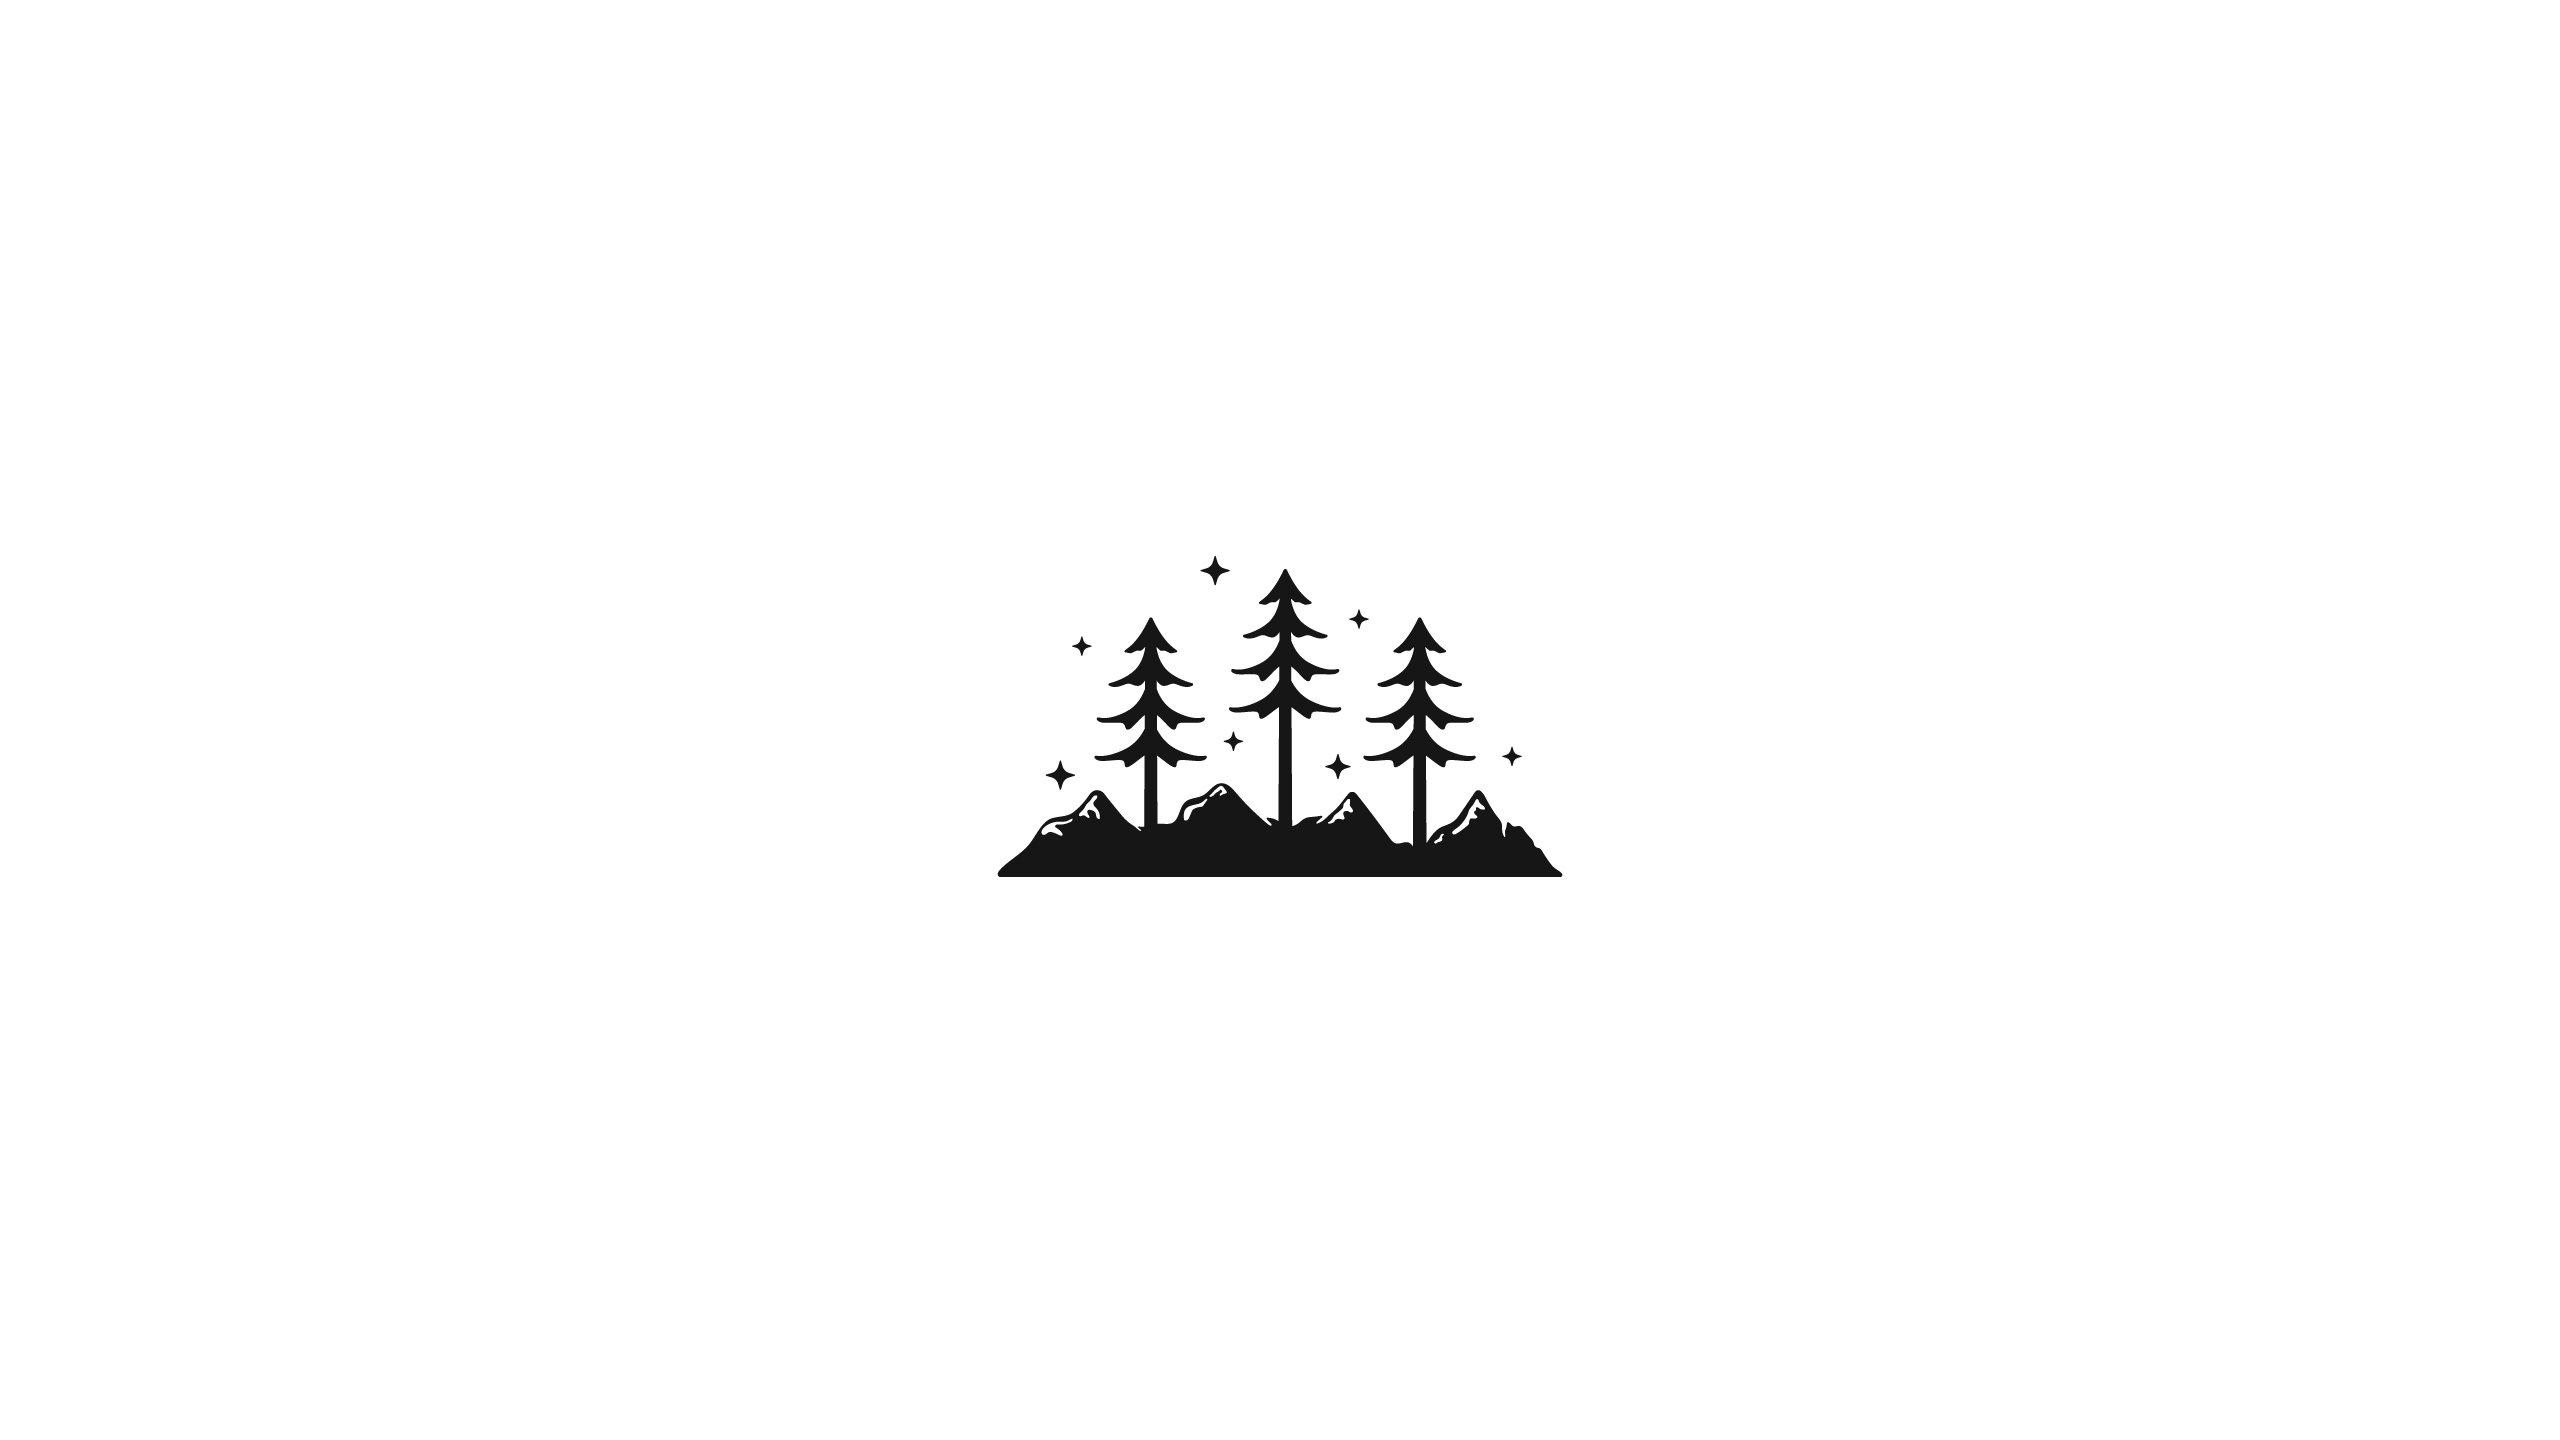 Fond Décran 2560x1440 Px Illustration Minimalisme